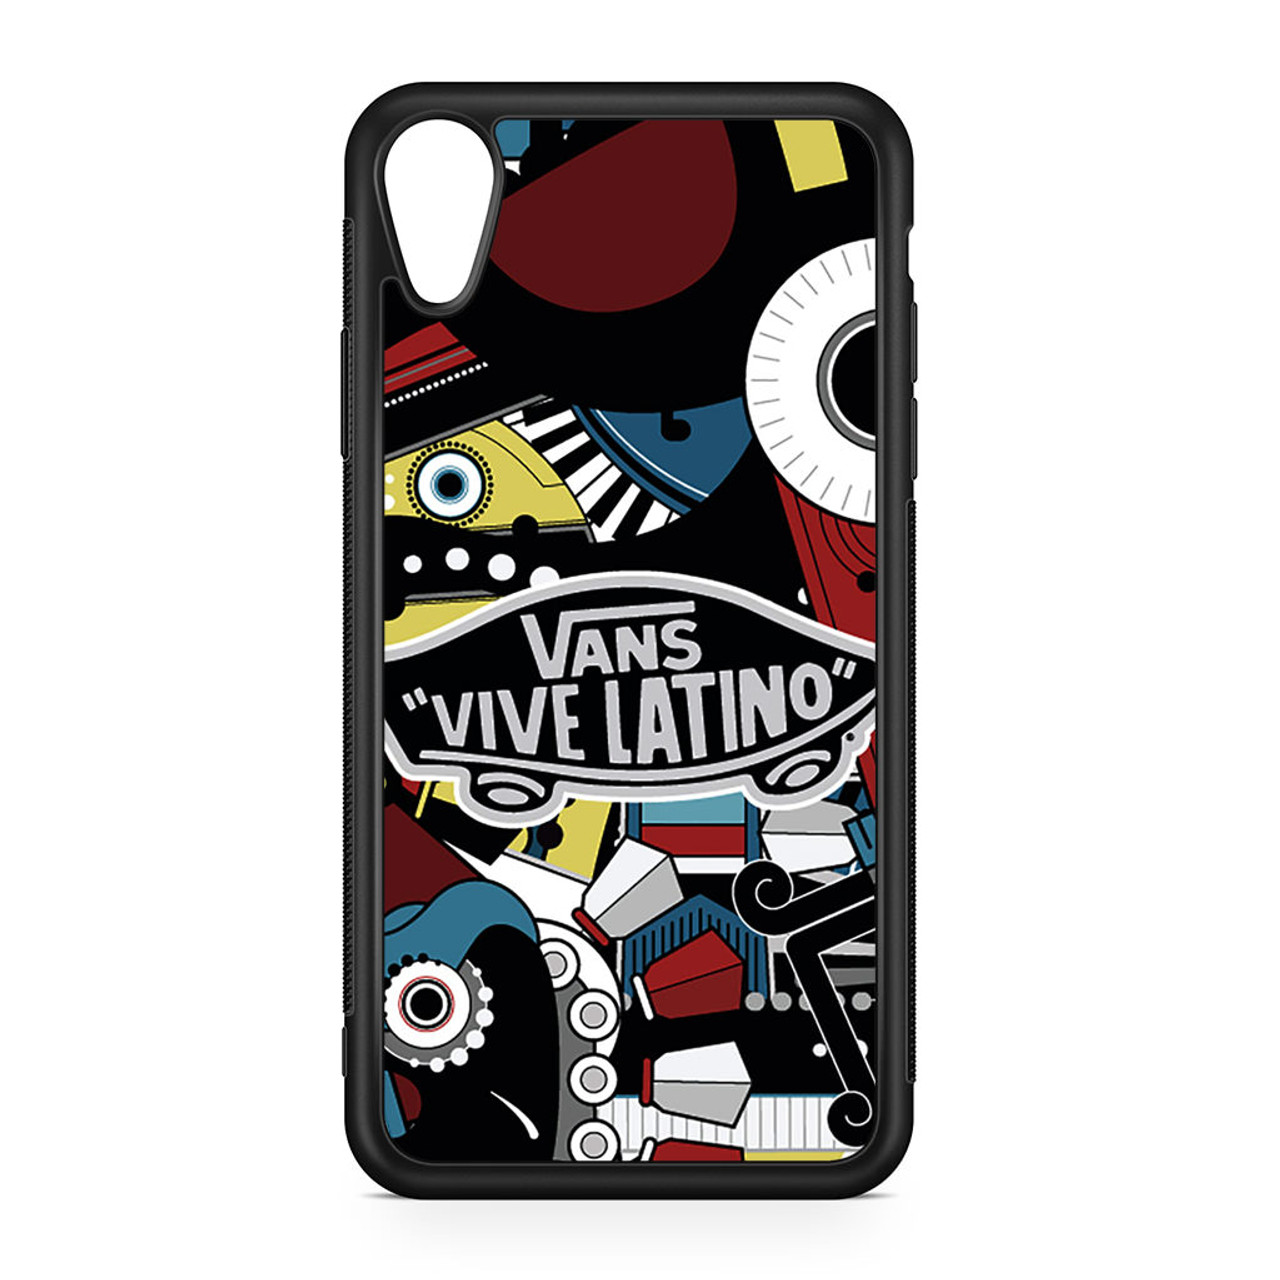 size 40 7055e 143fe Vans Vive Latino iPhone XR Case